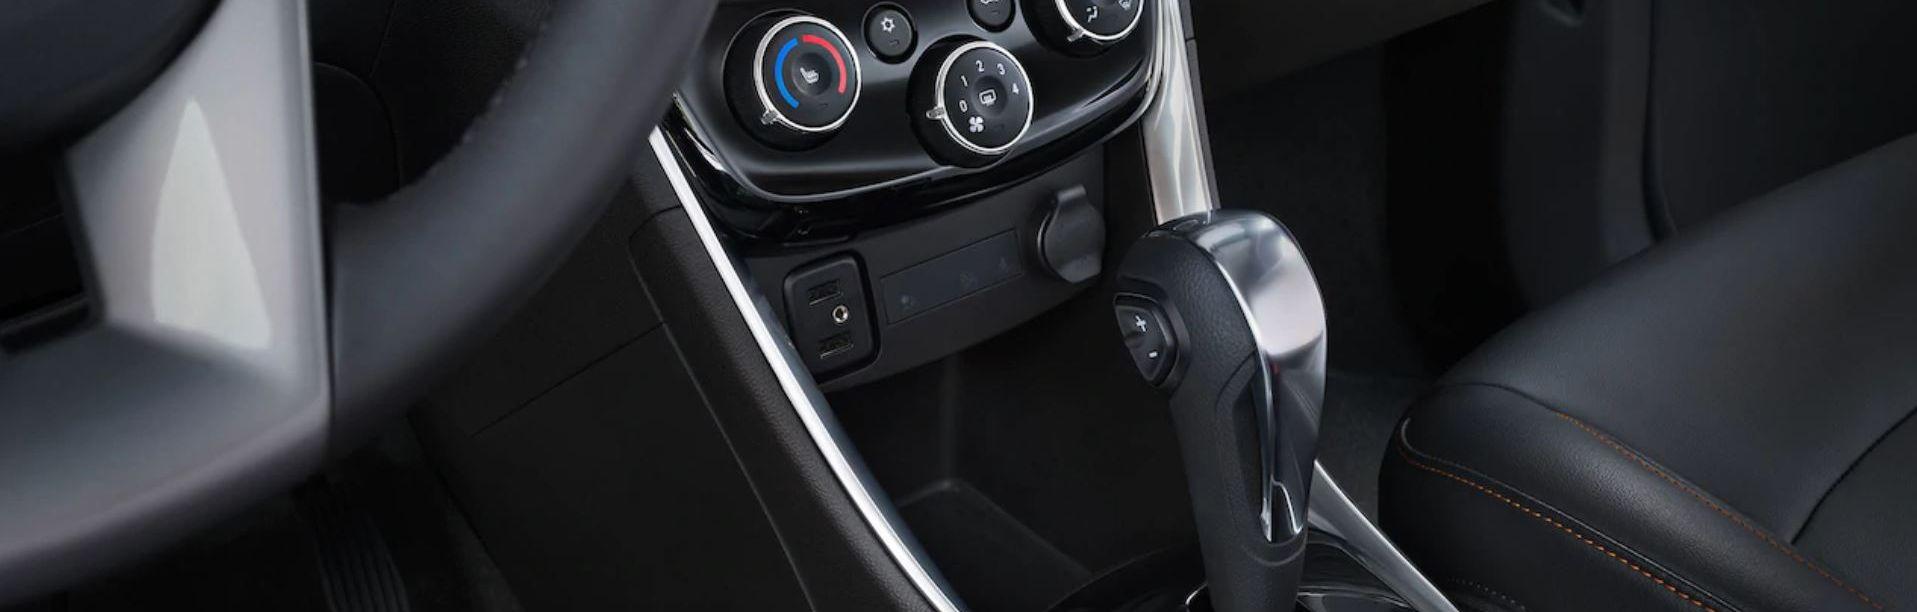 2019 Chevrolet Trax Interior Detailing